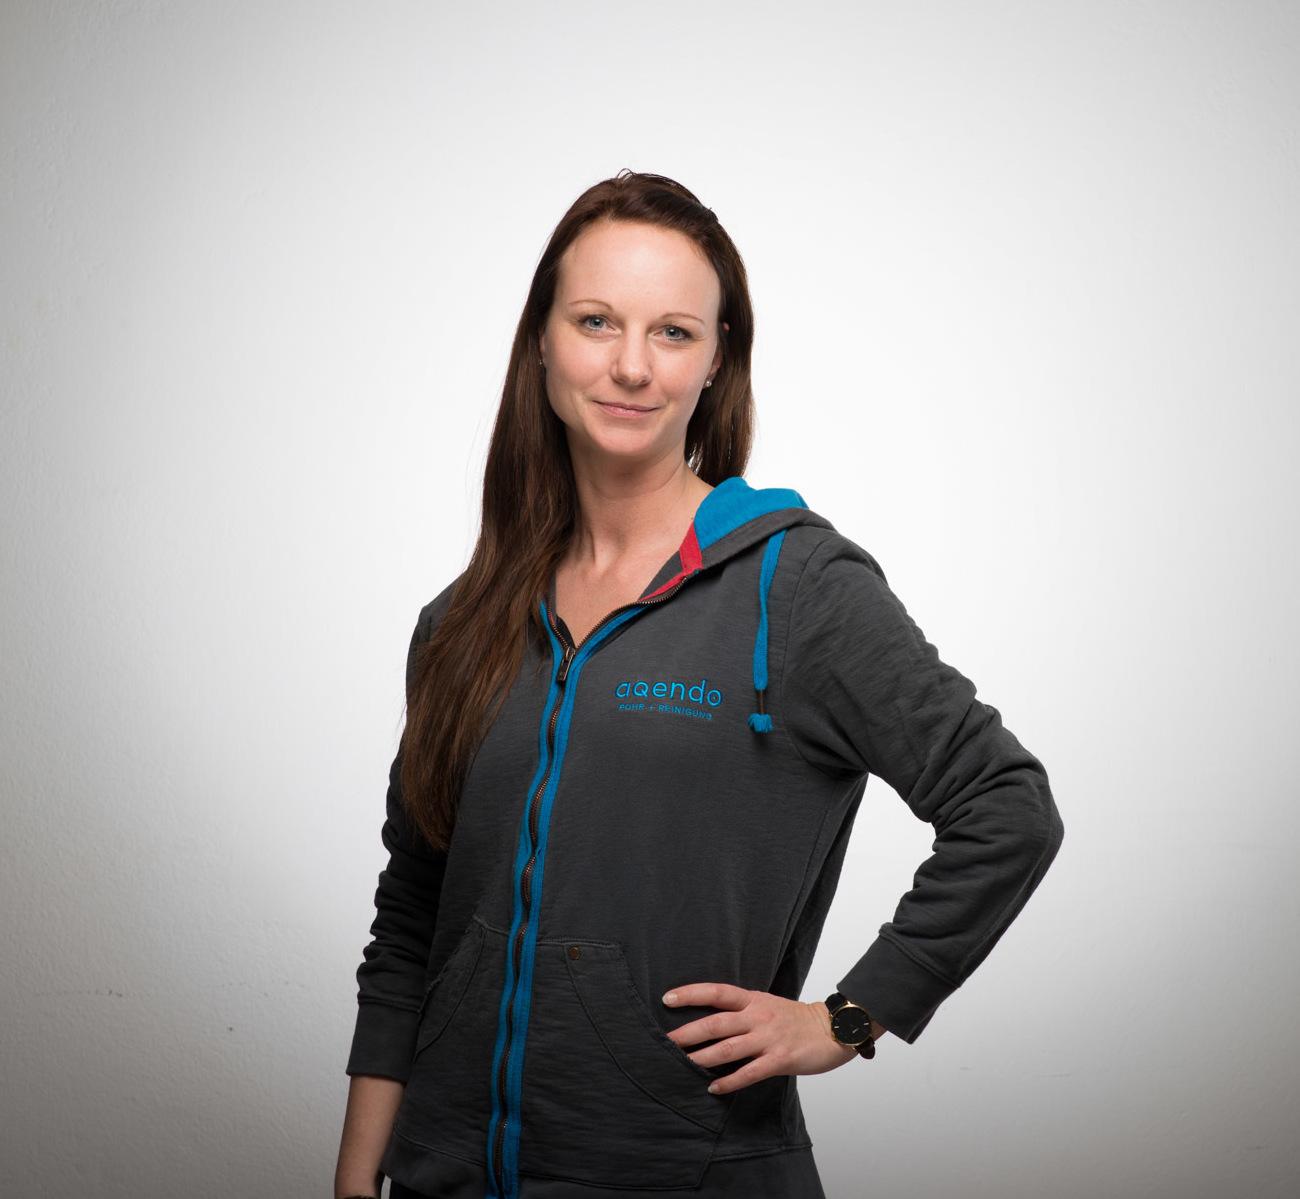 Sonja Prucha